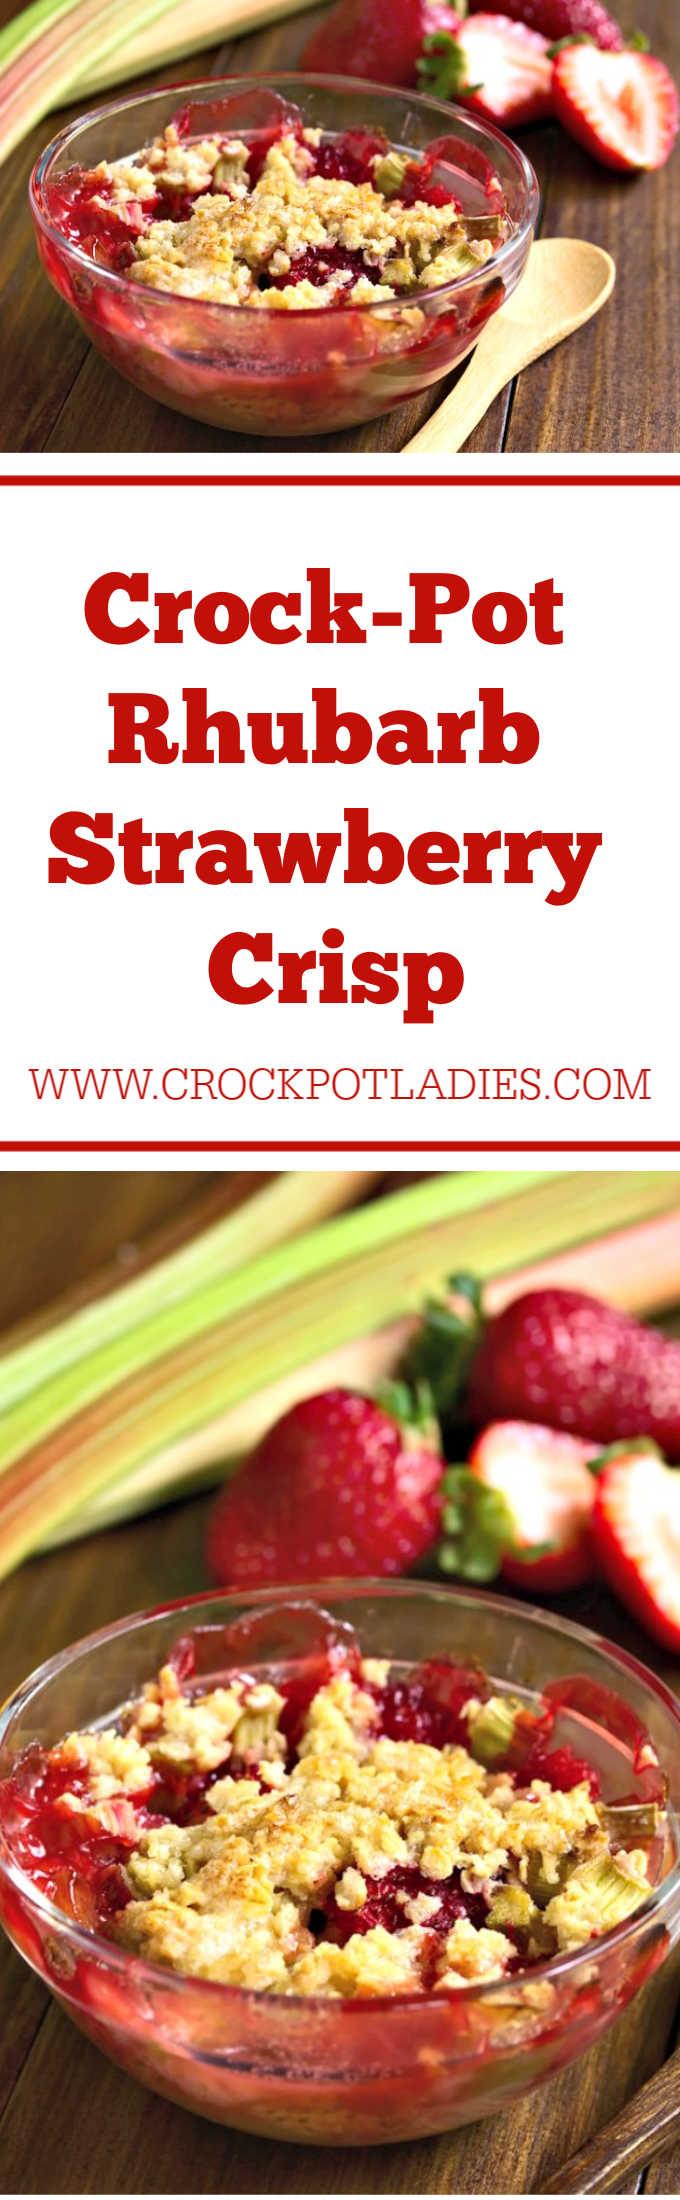 Crock-Pot Rhubarb Strawberry Crisp